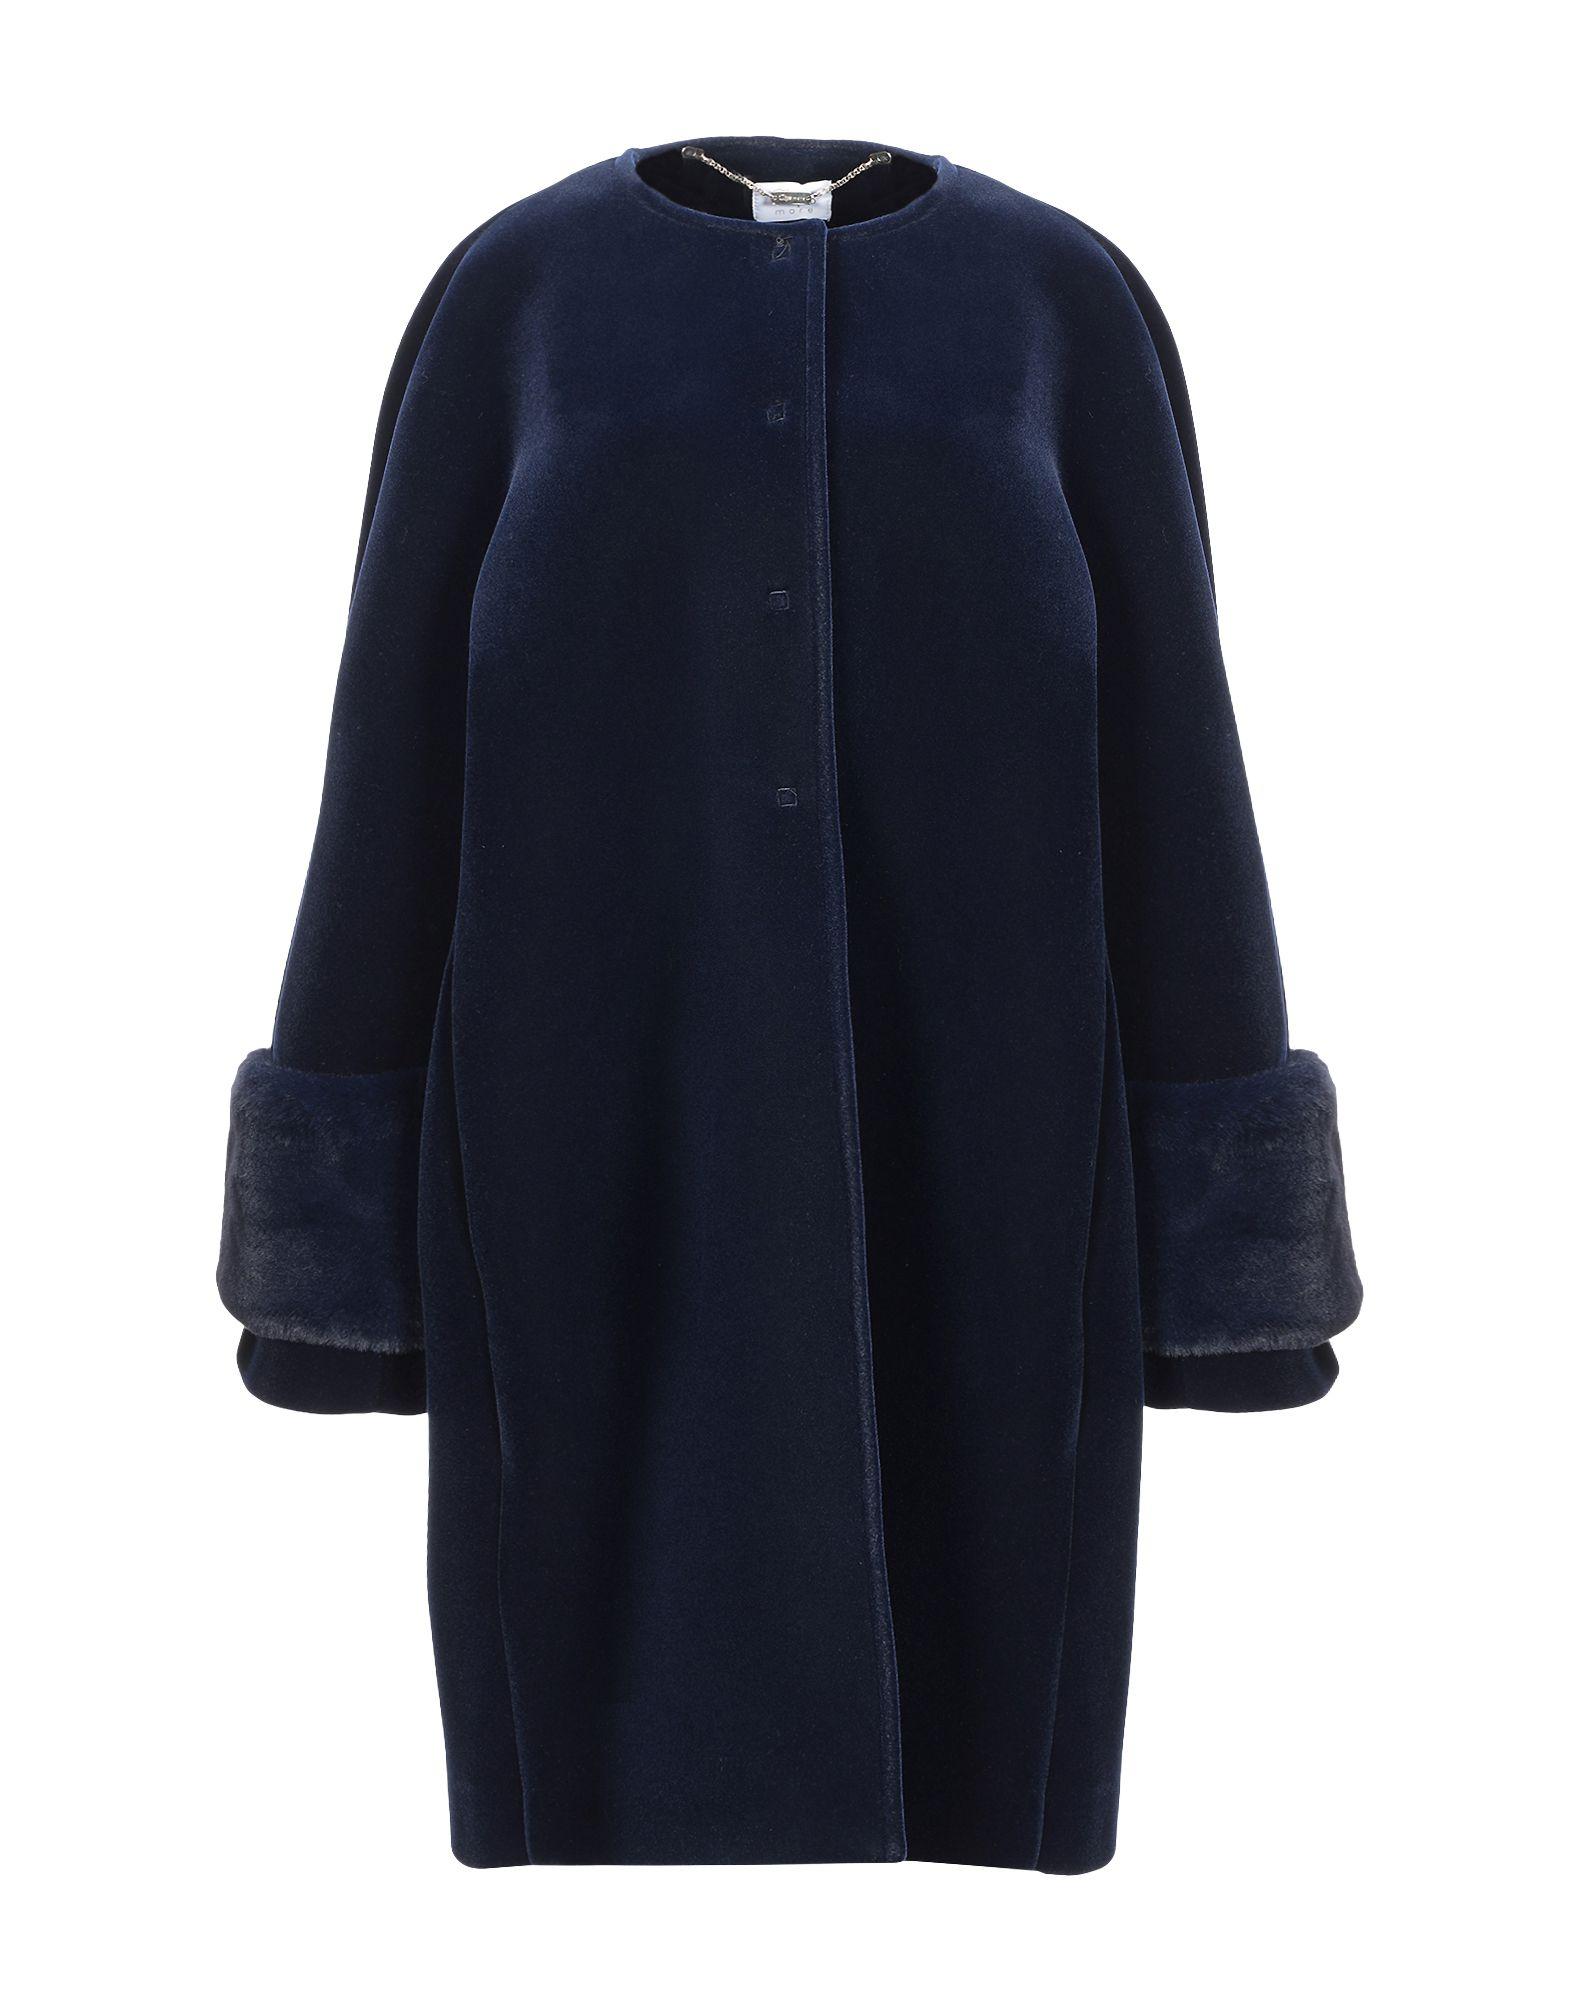 Фото - CLIPS MORE Пальто clips more легкое пальто